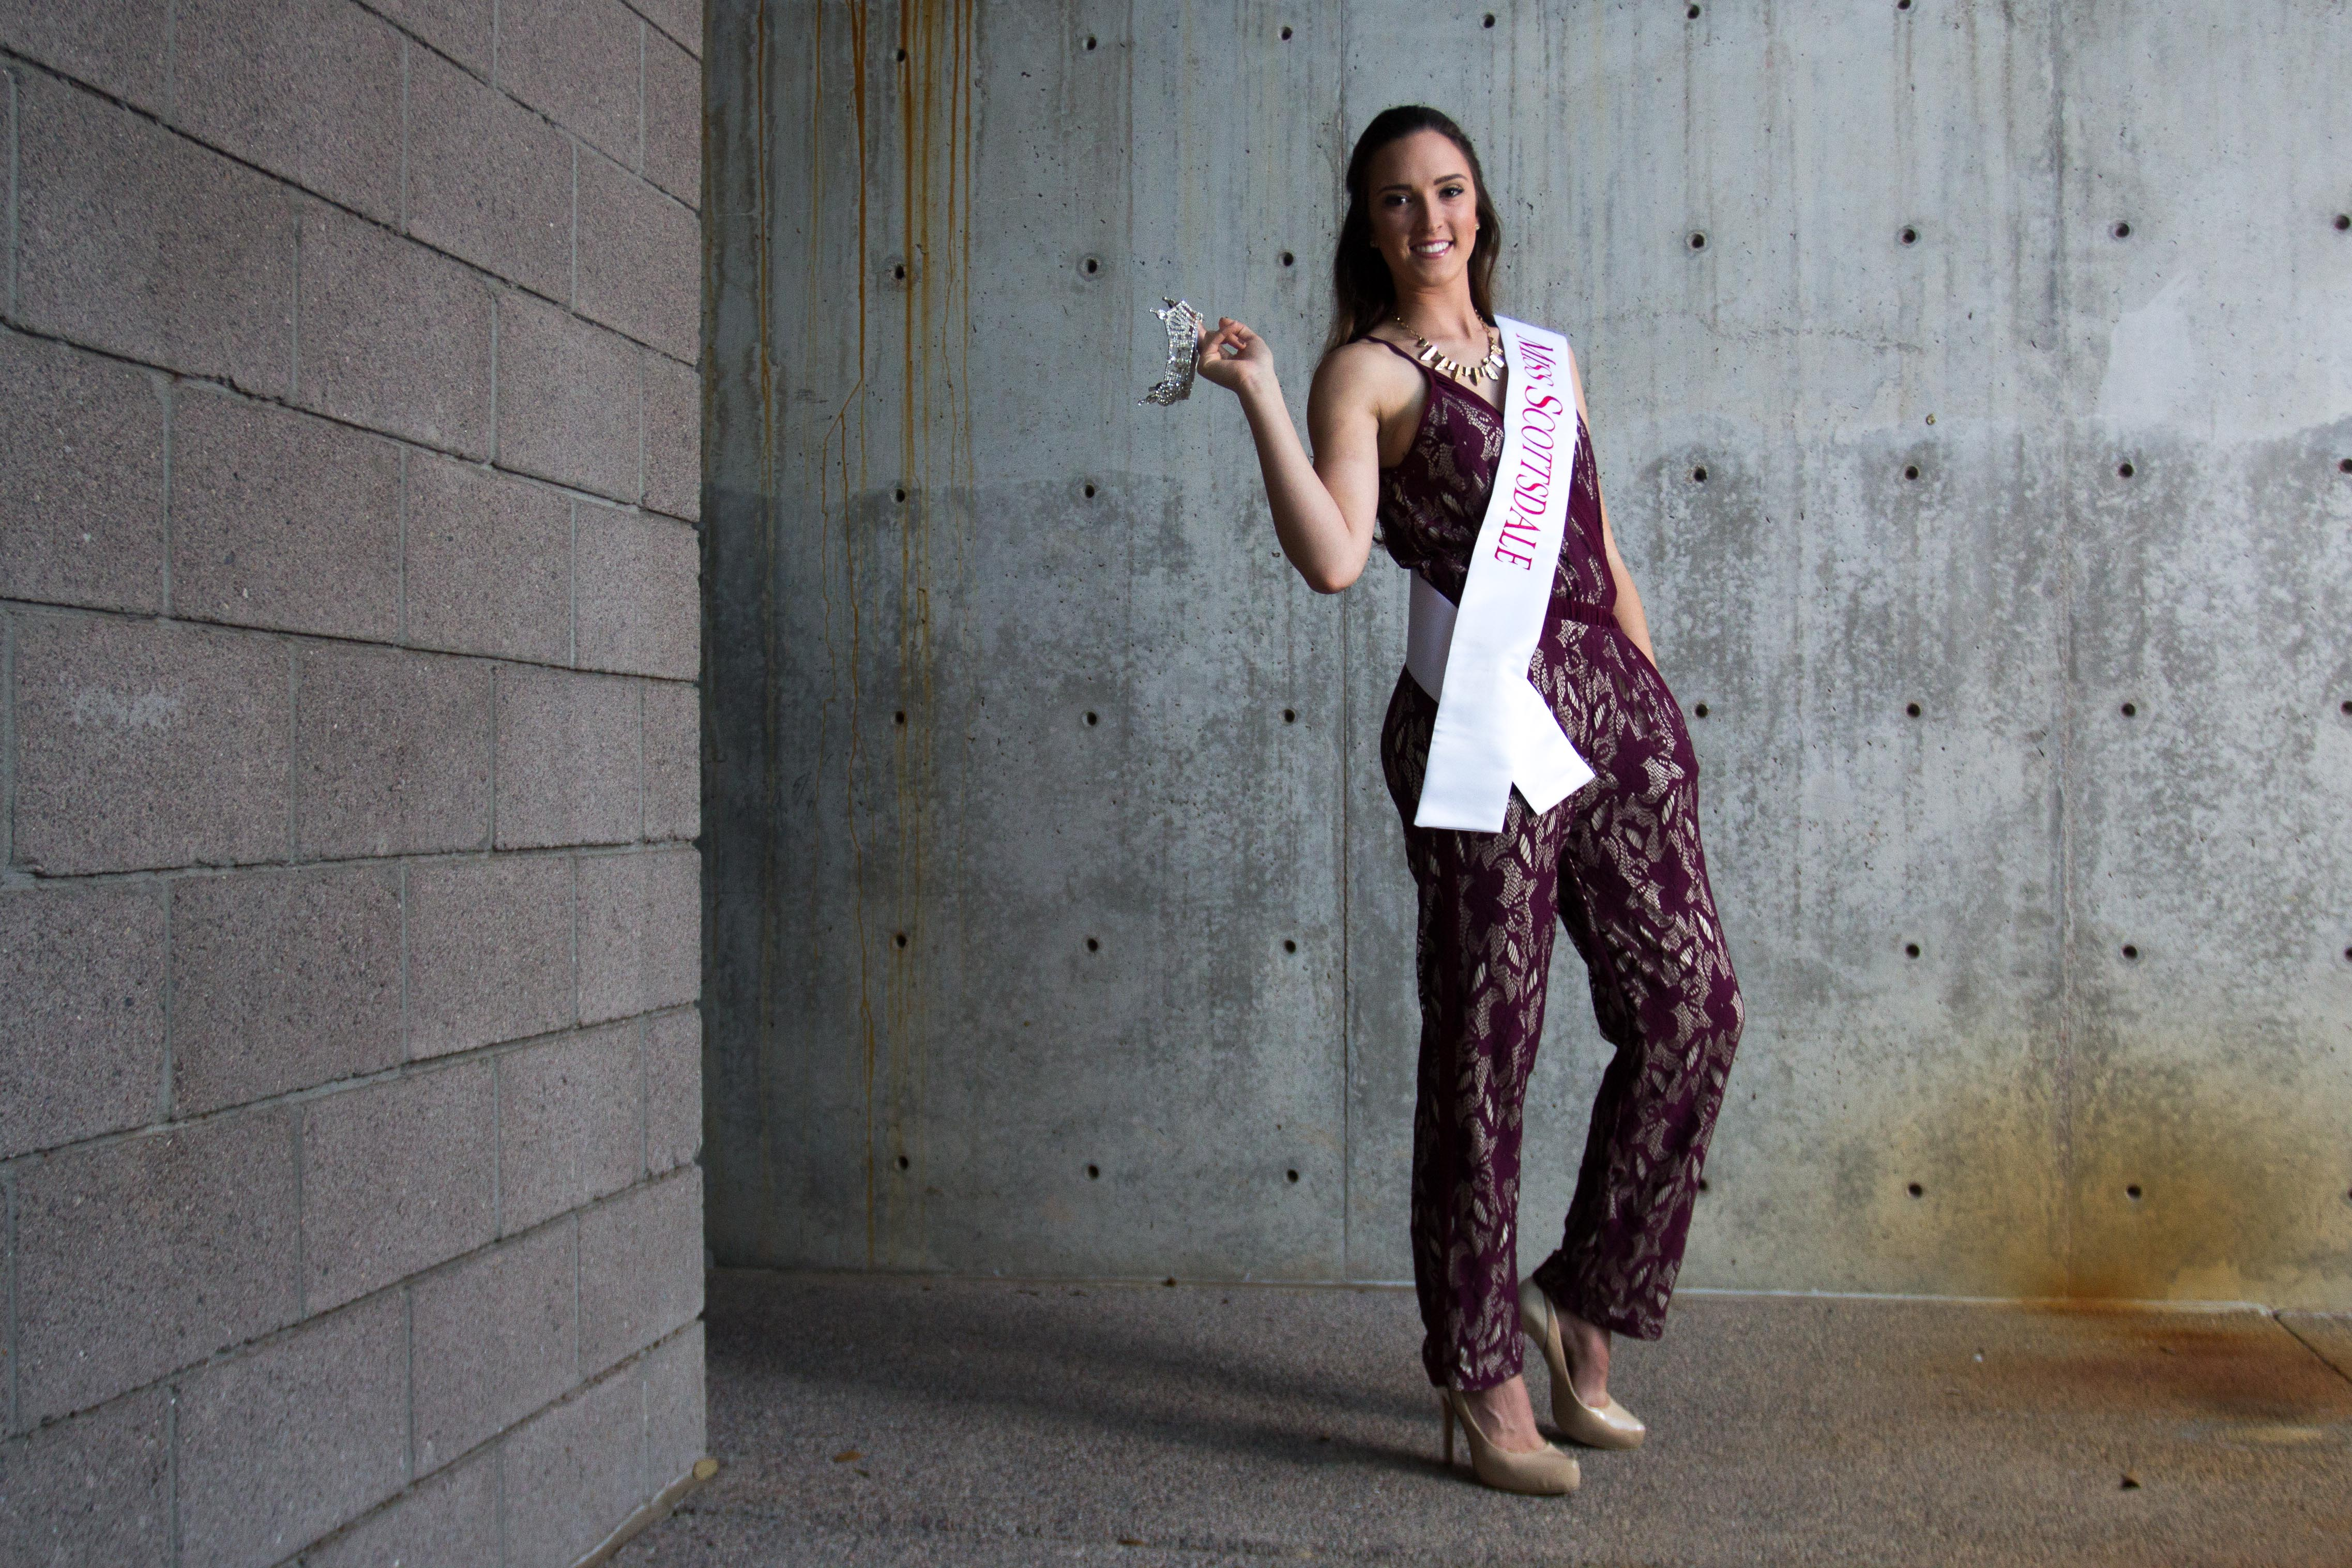 Miss Scottsdale 2015